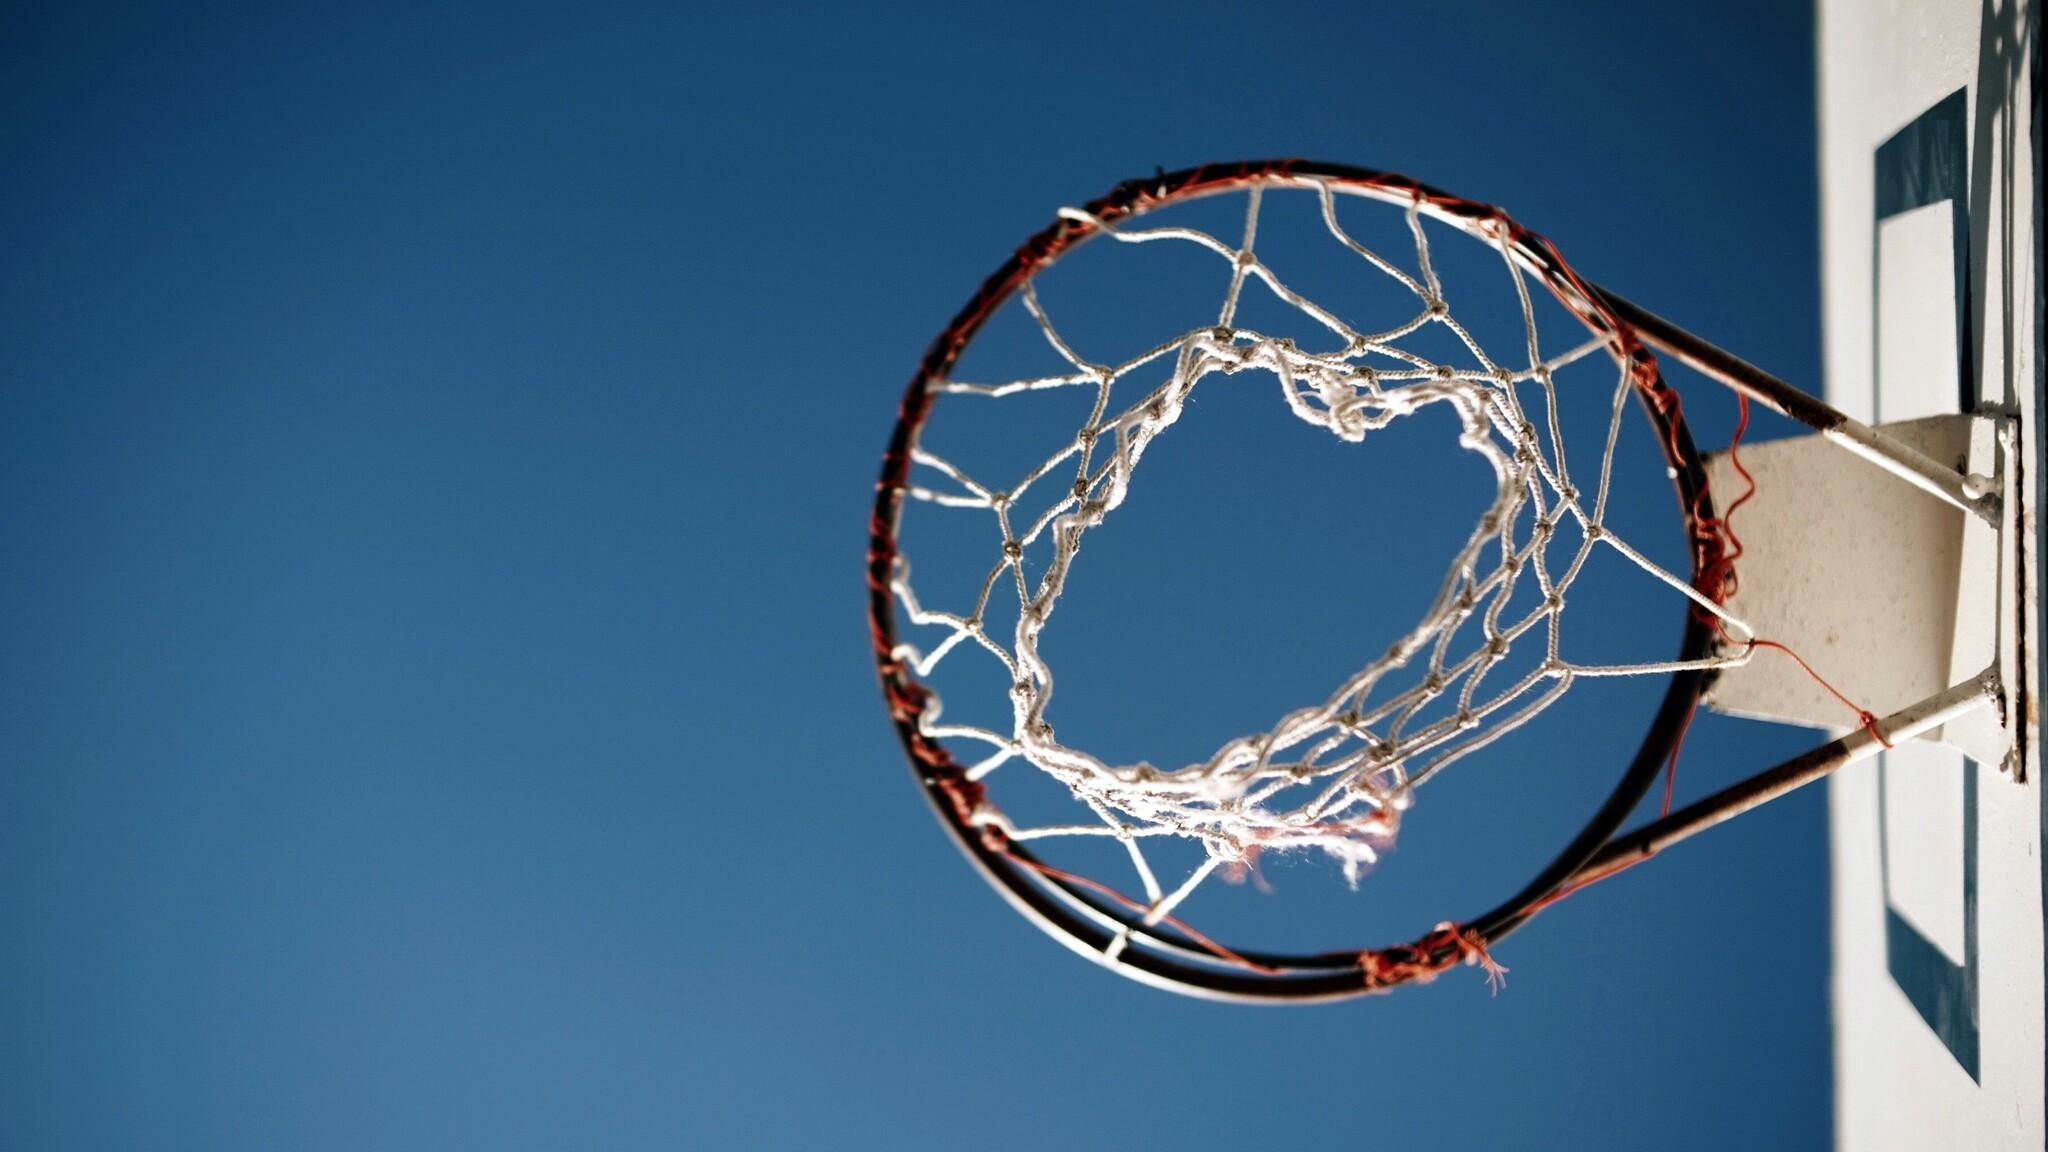 2048x1152 Basketball Ring 2048x1152 Resolution Hd 4k Wallpapers